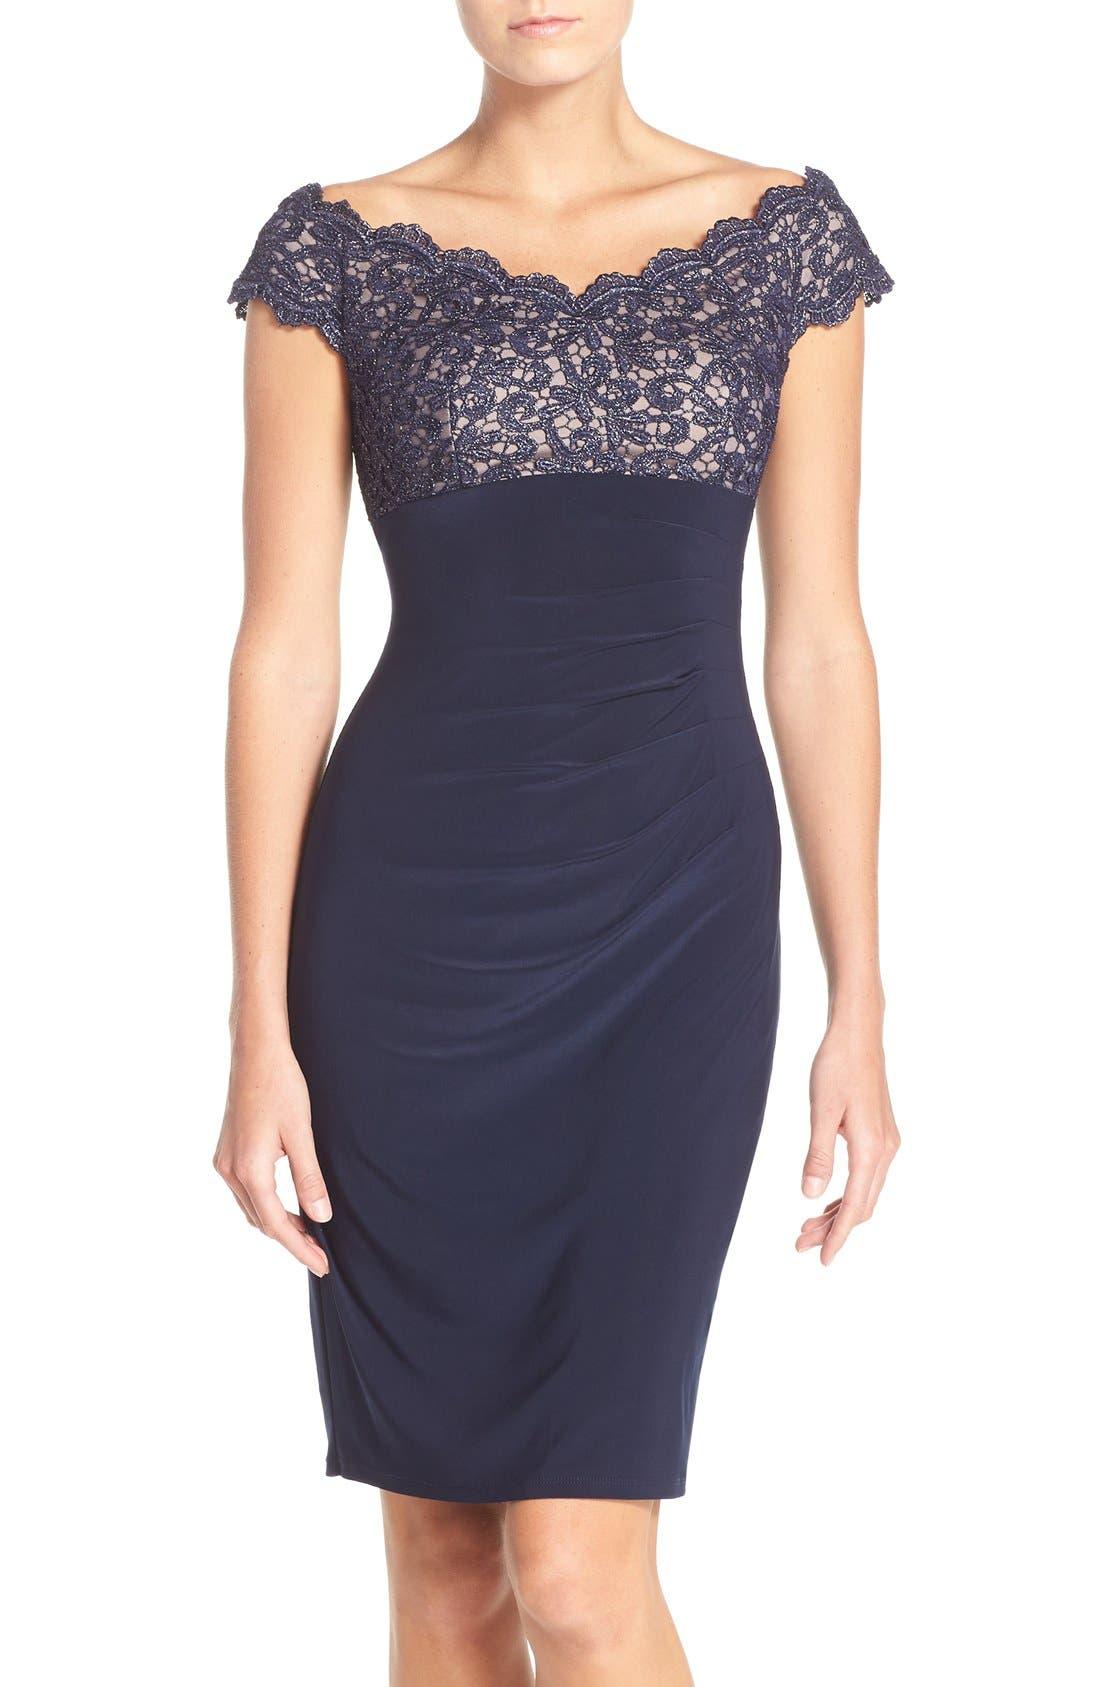 Alternate Image 1 Selected - Xscape Lace & Jersey Off the Shoulder Sheath Dress (Petite)